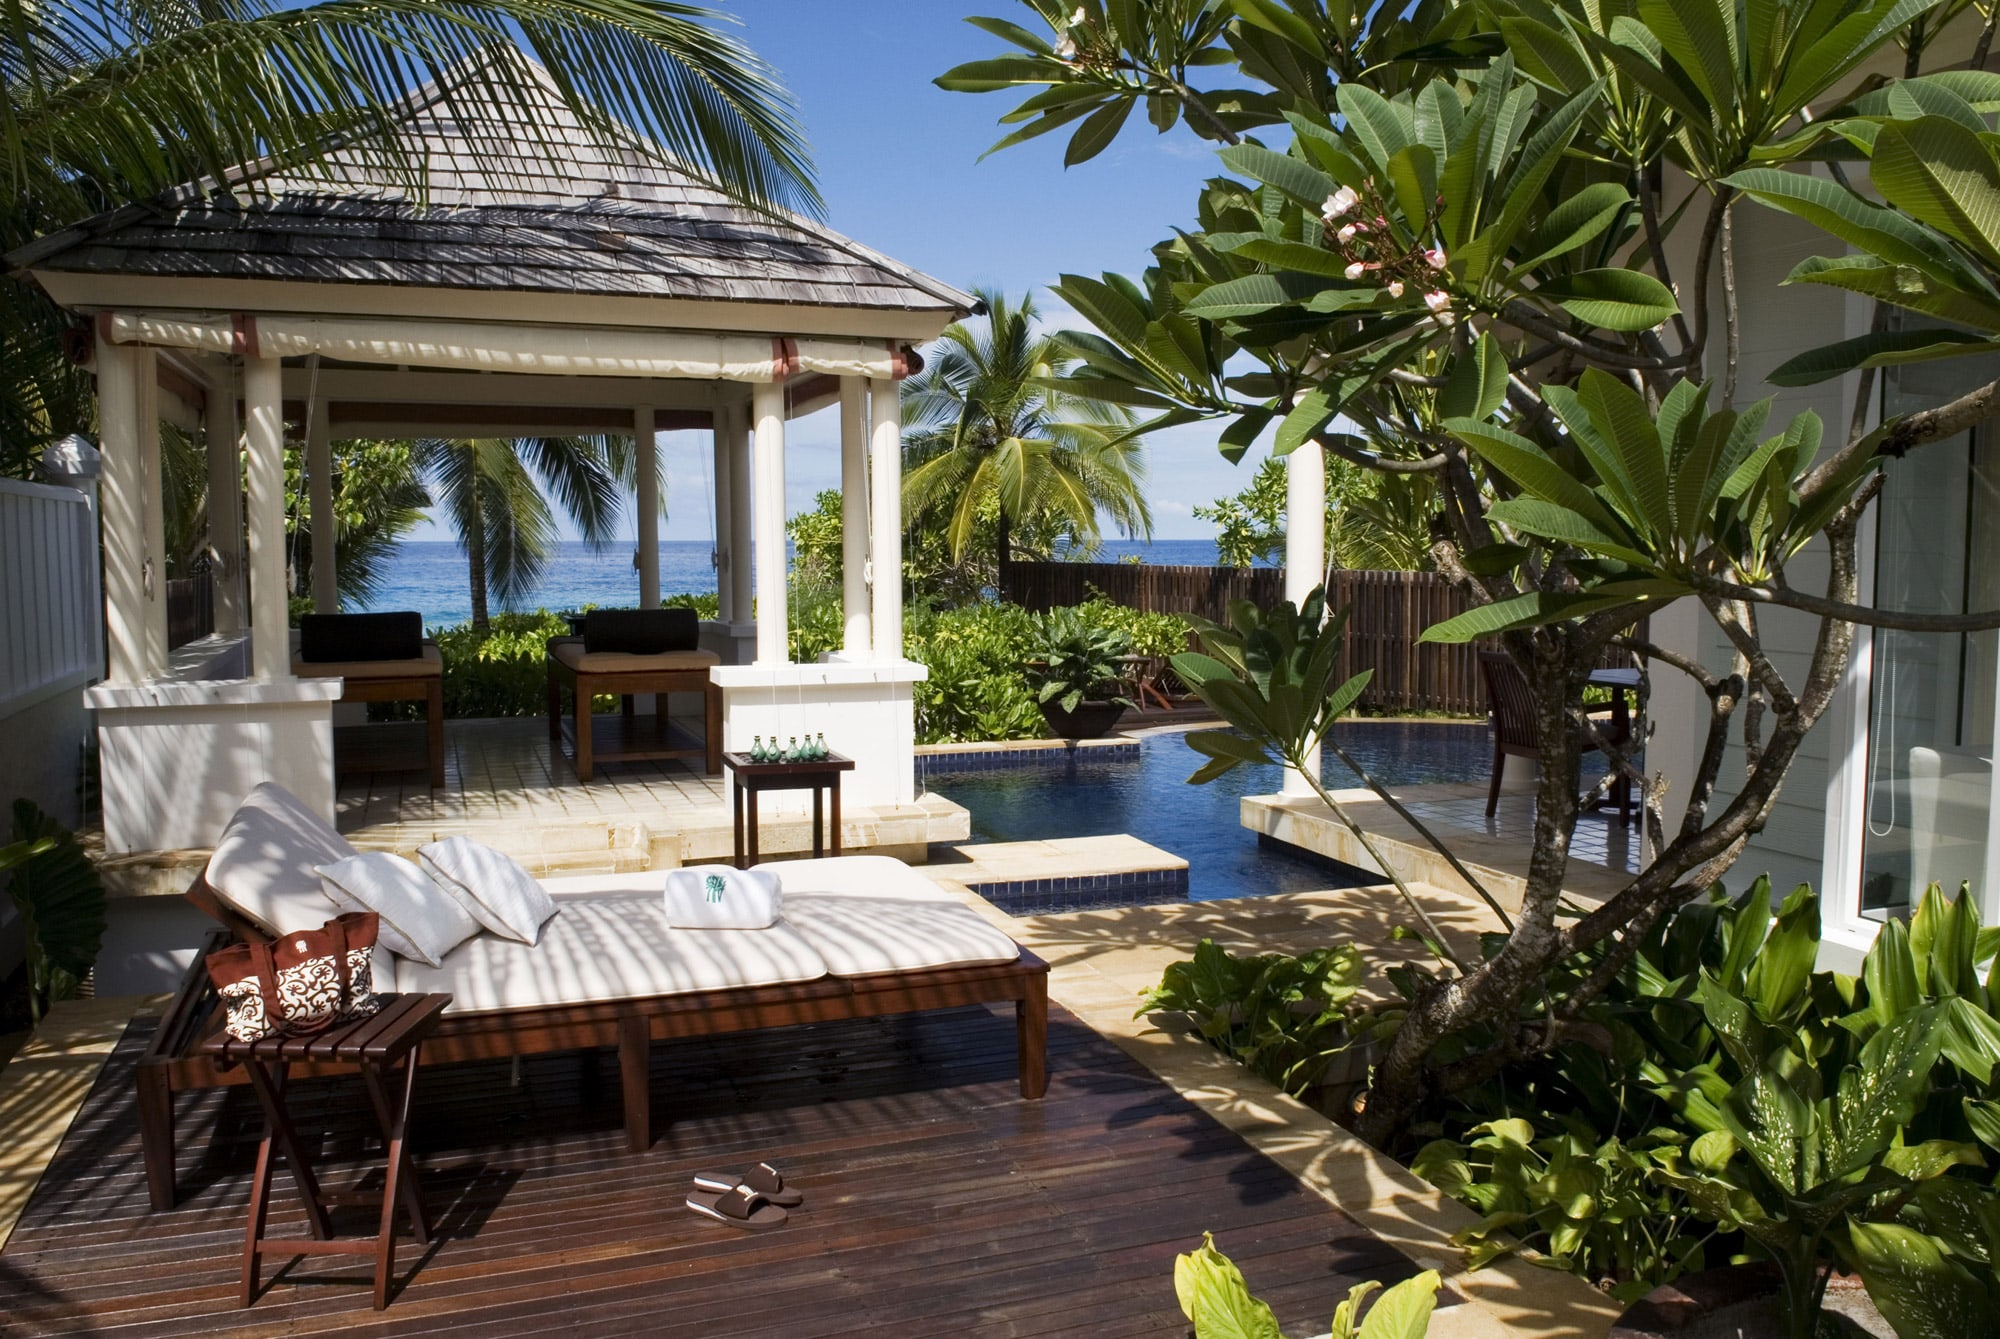 Banyan Tree Seychelles - The Seychelles